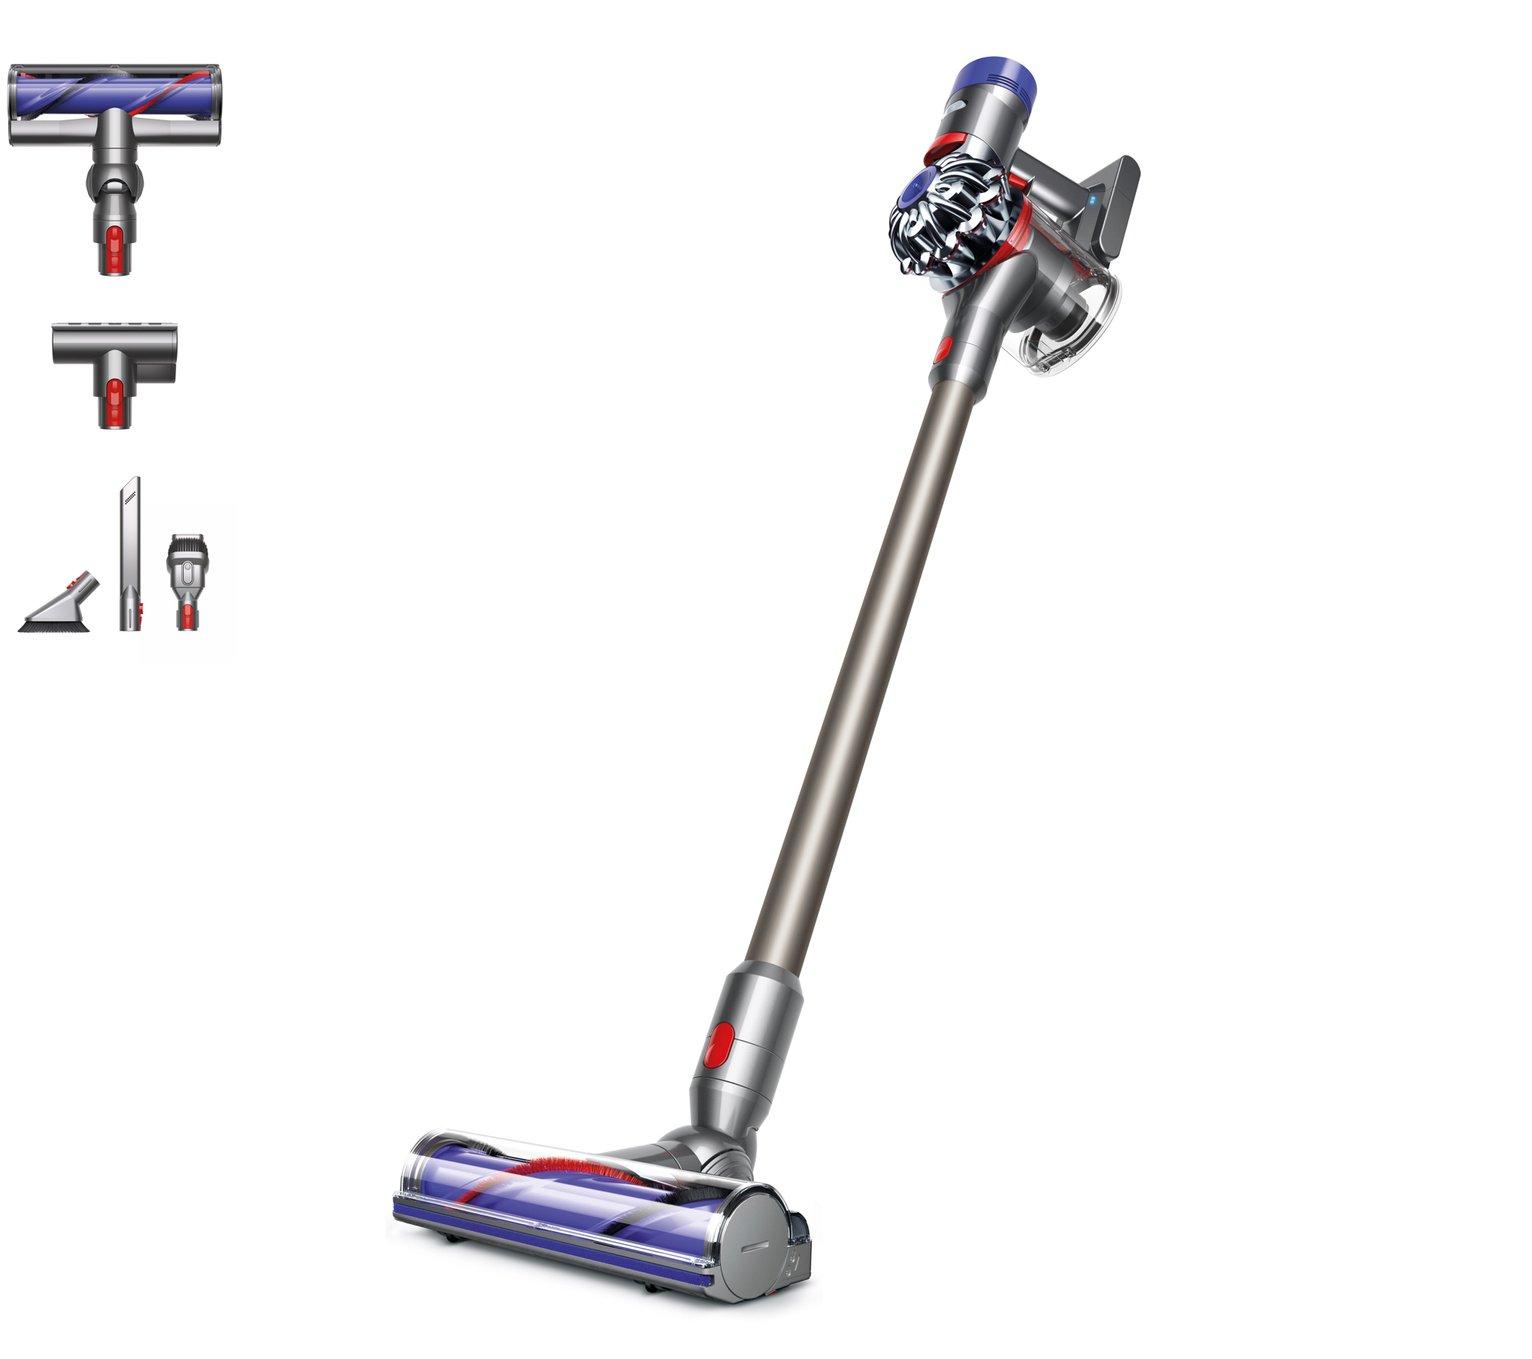 Dyson - V8 Animal - Cordless - Handstick Vacuum Cleaner